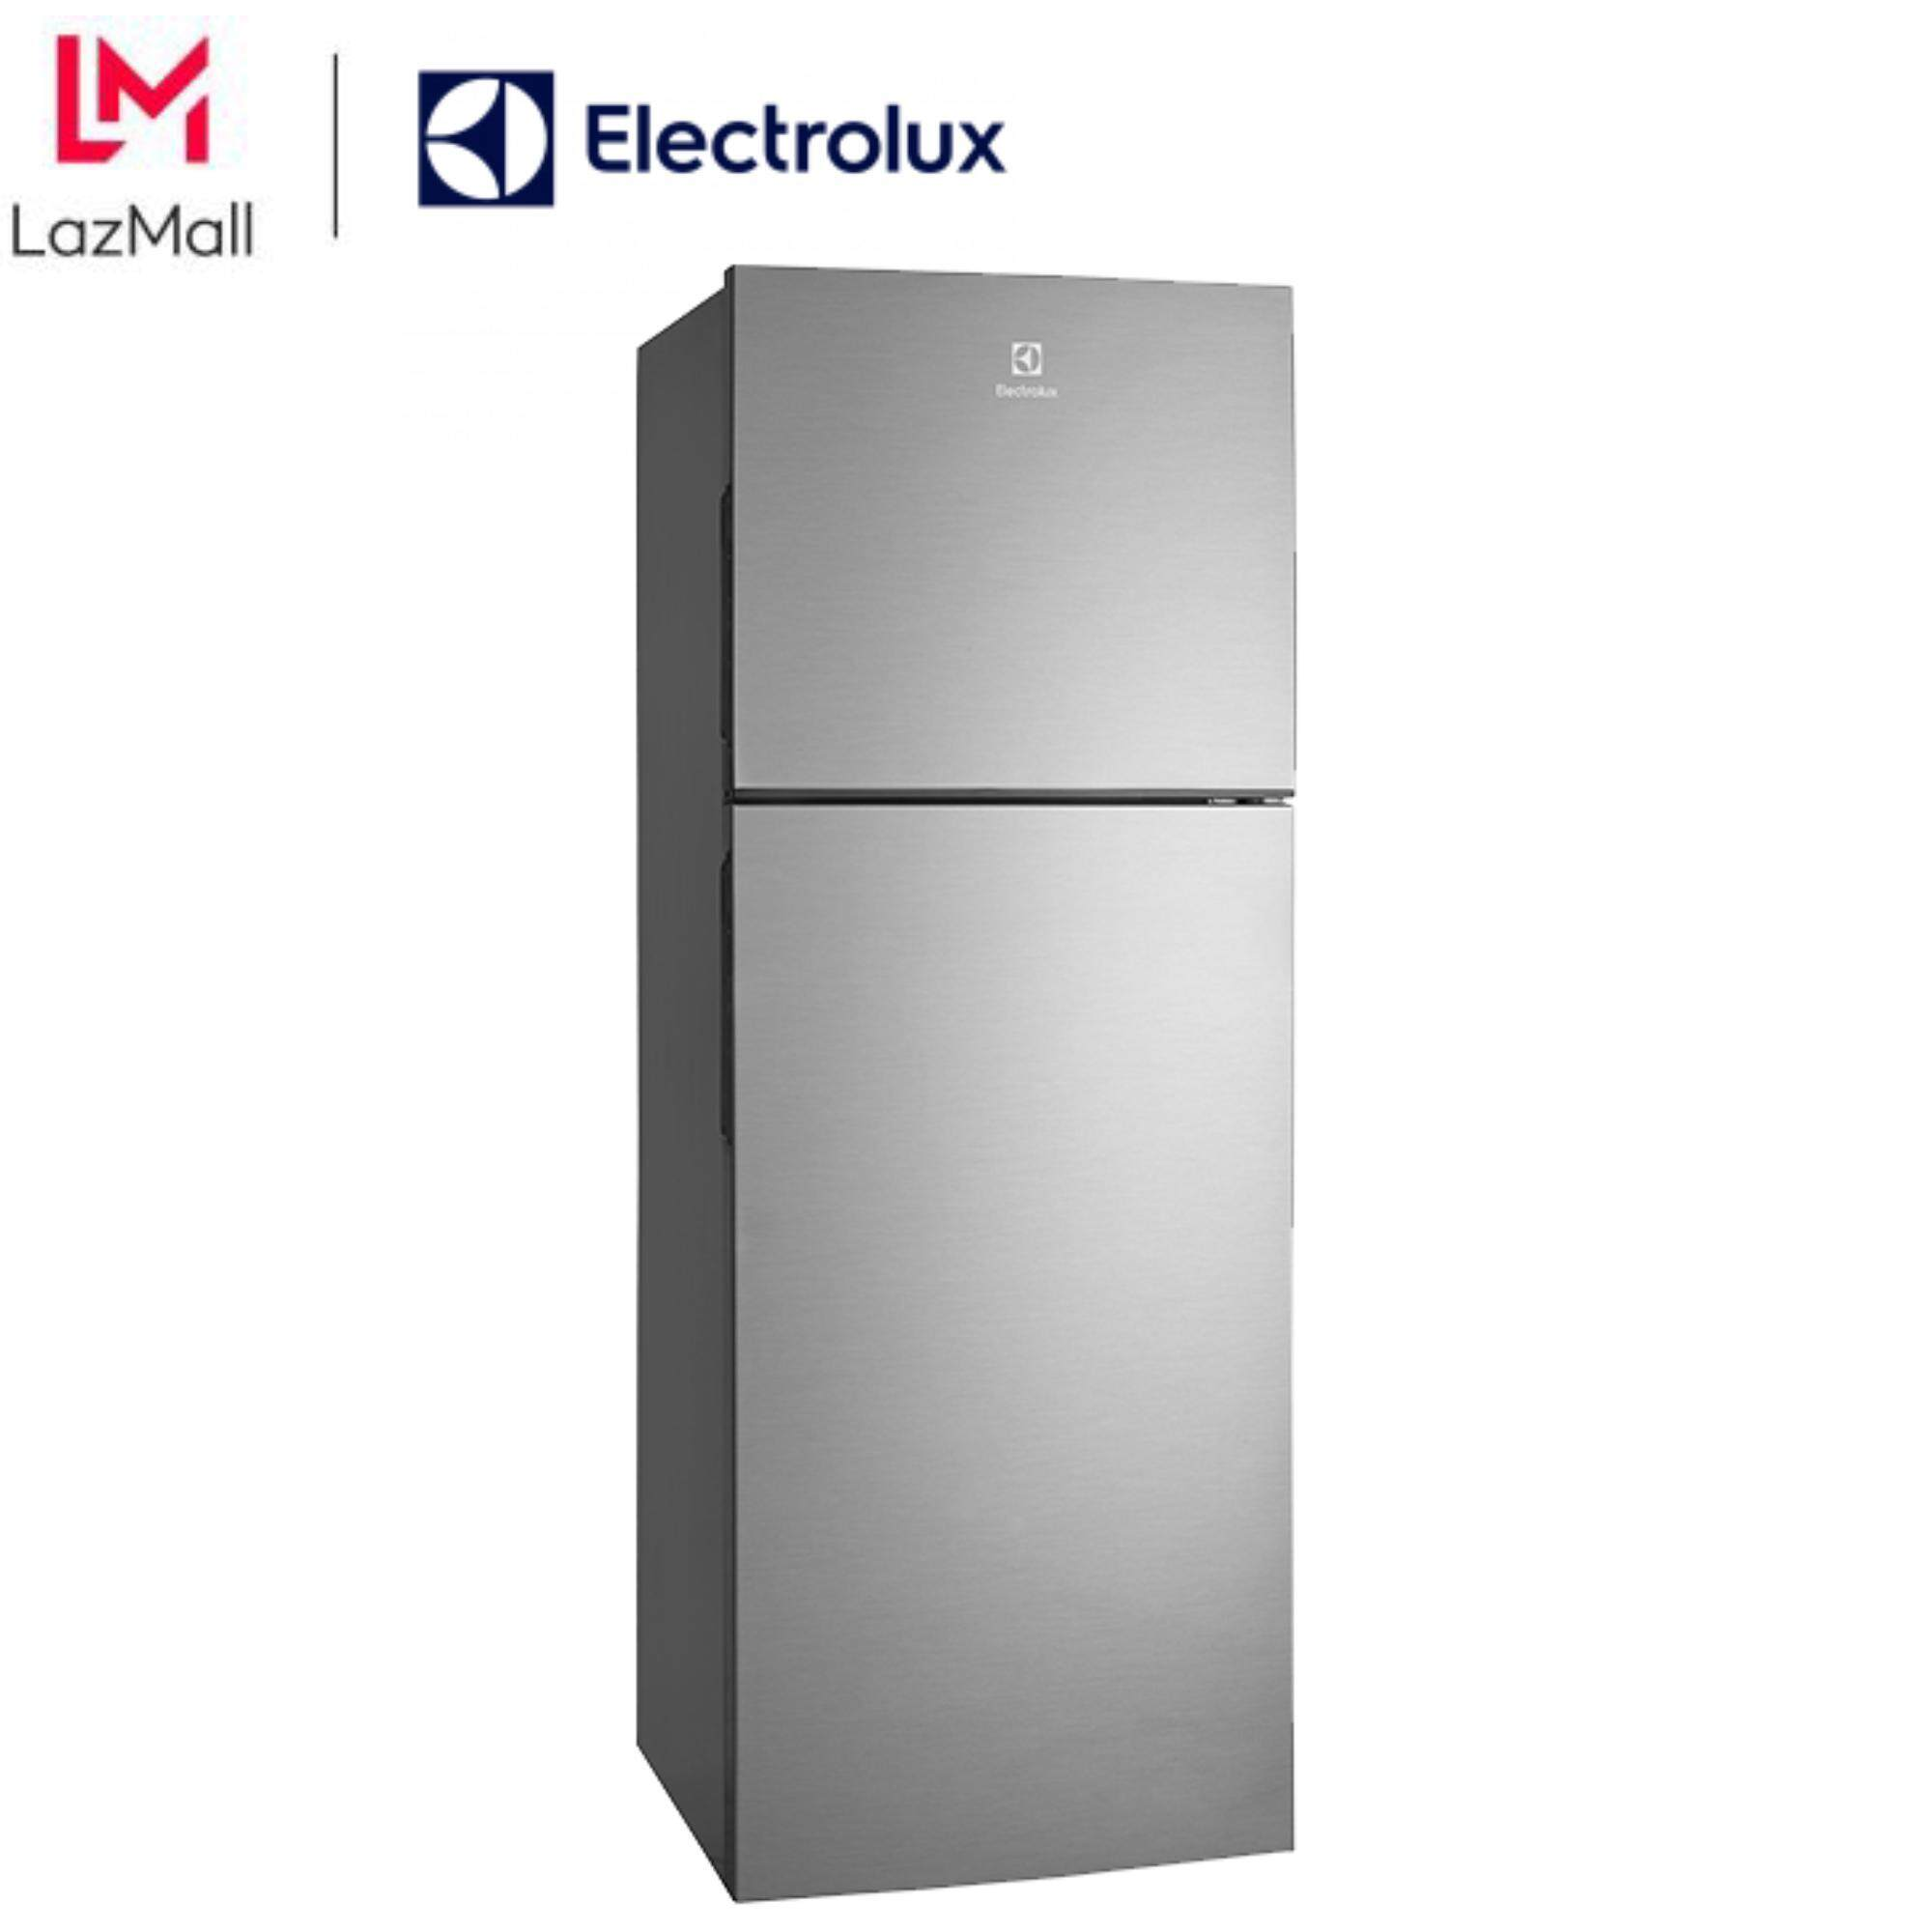 Electrolux 2 Door Refrigerator ETB2102MG 210L